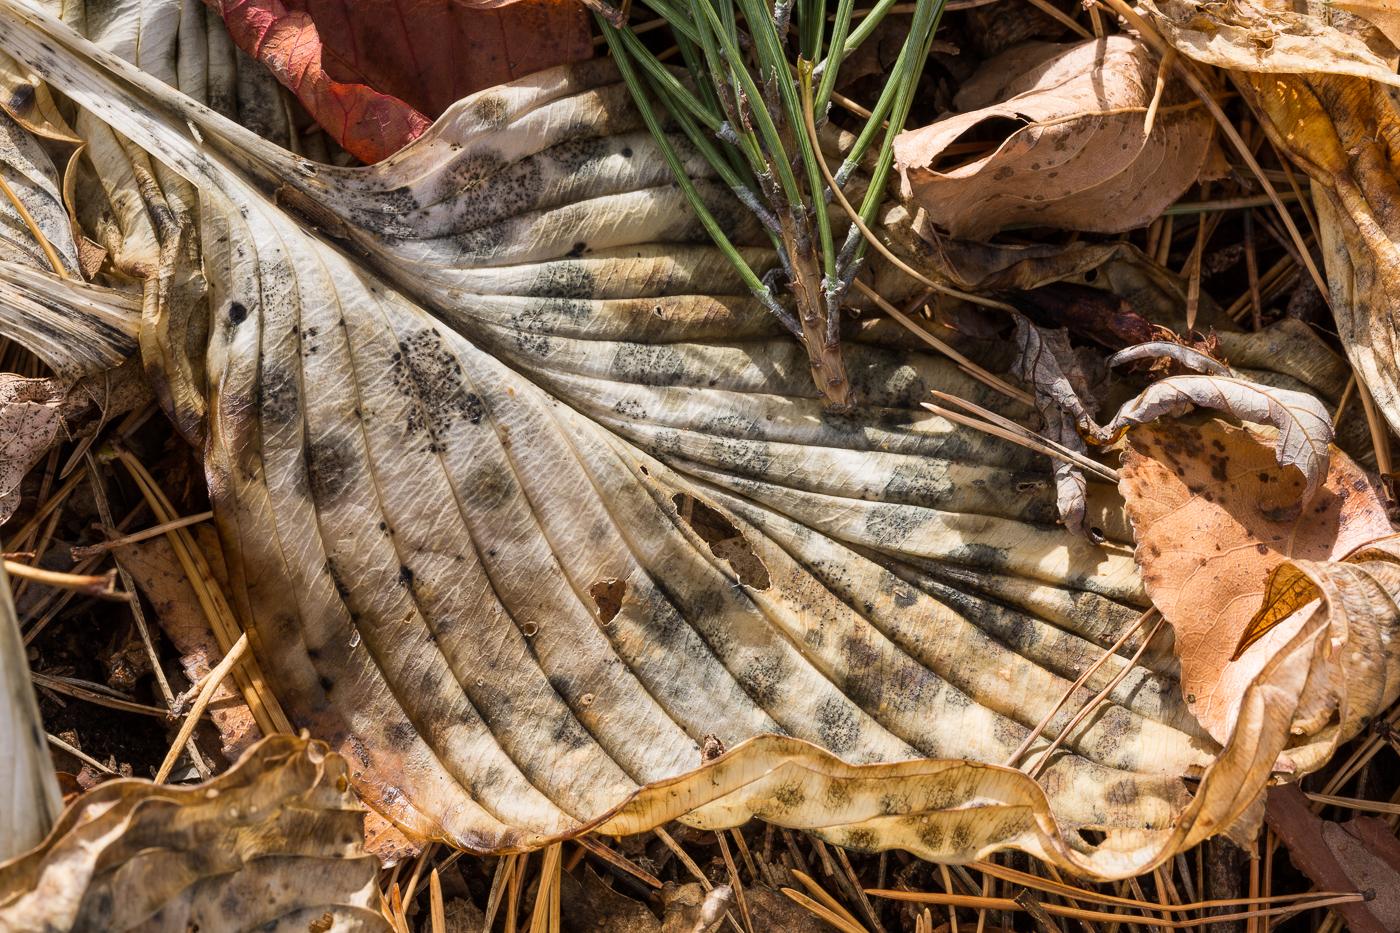 Hosta Leaf with Pine